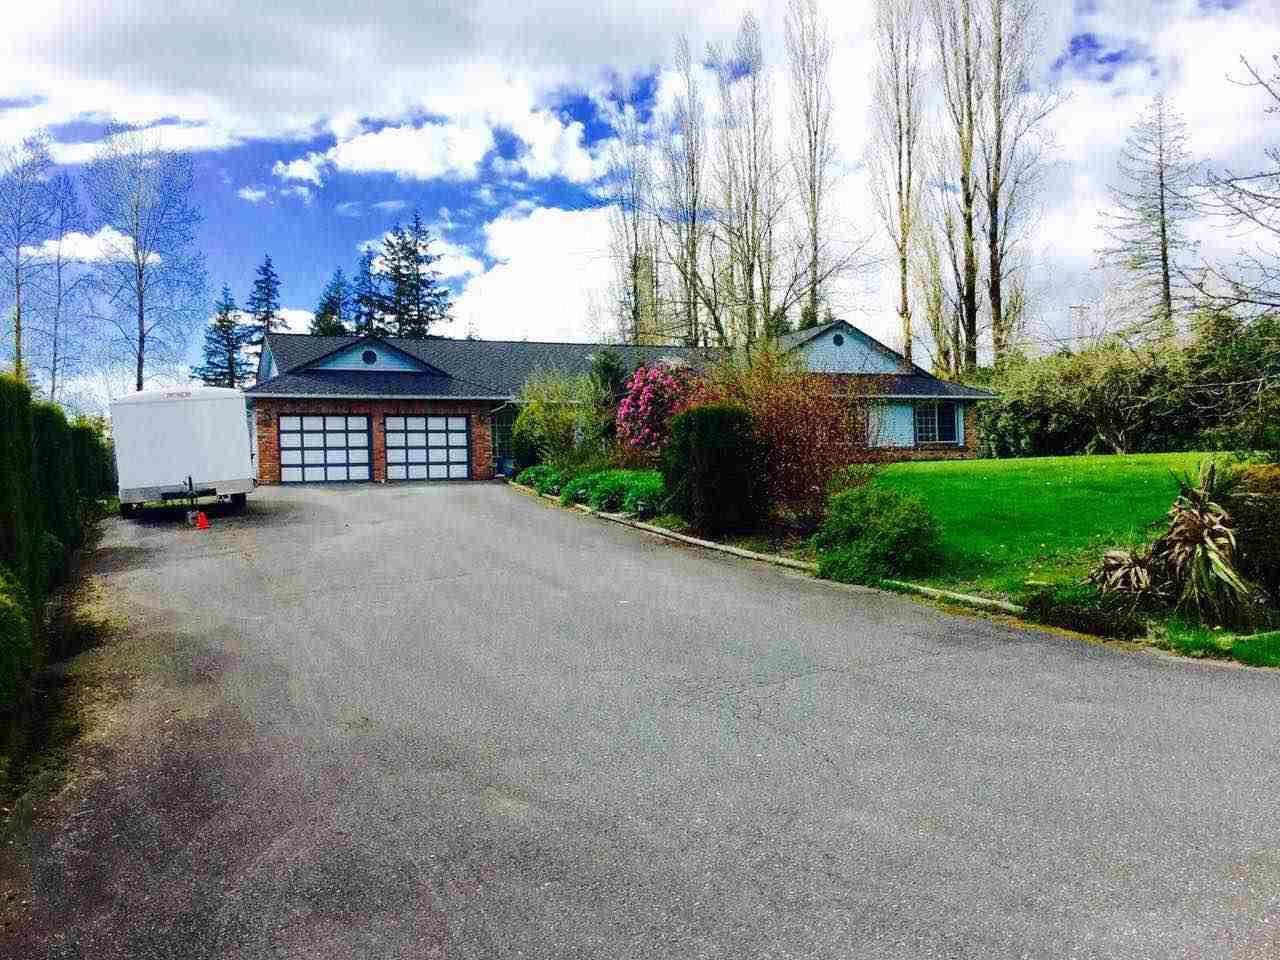 Detached at 7185 205 STREET, Langley, British Columbia. Image 2